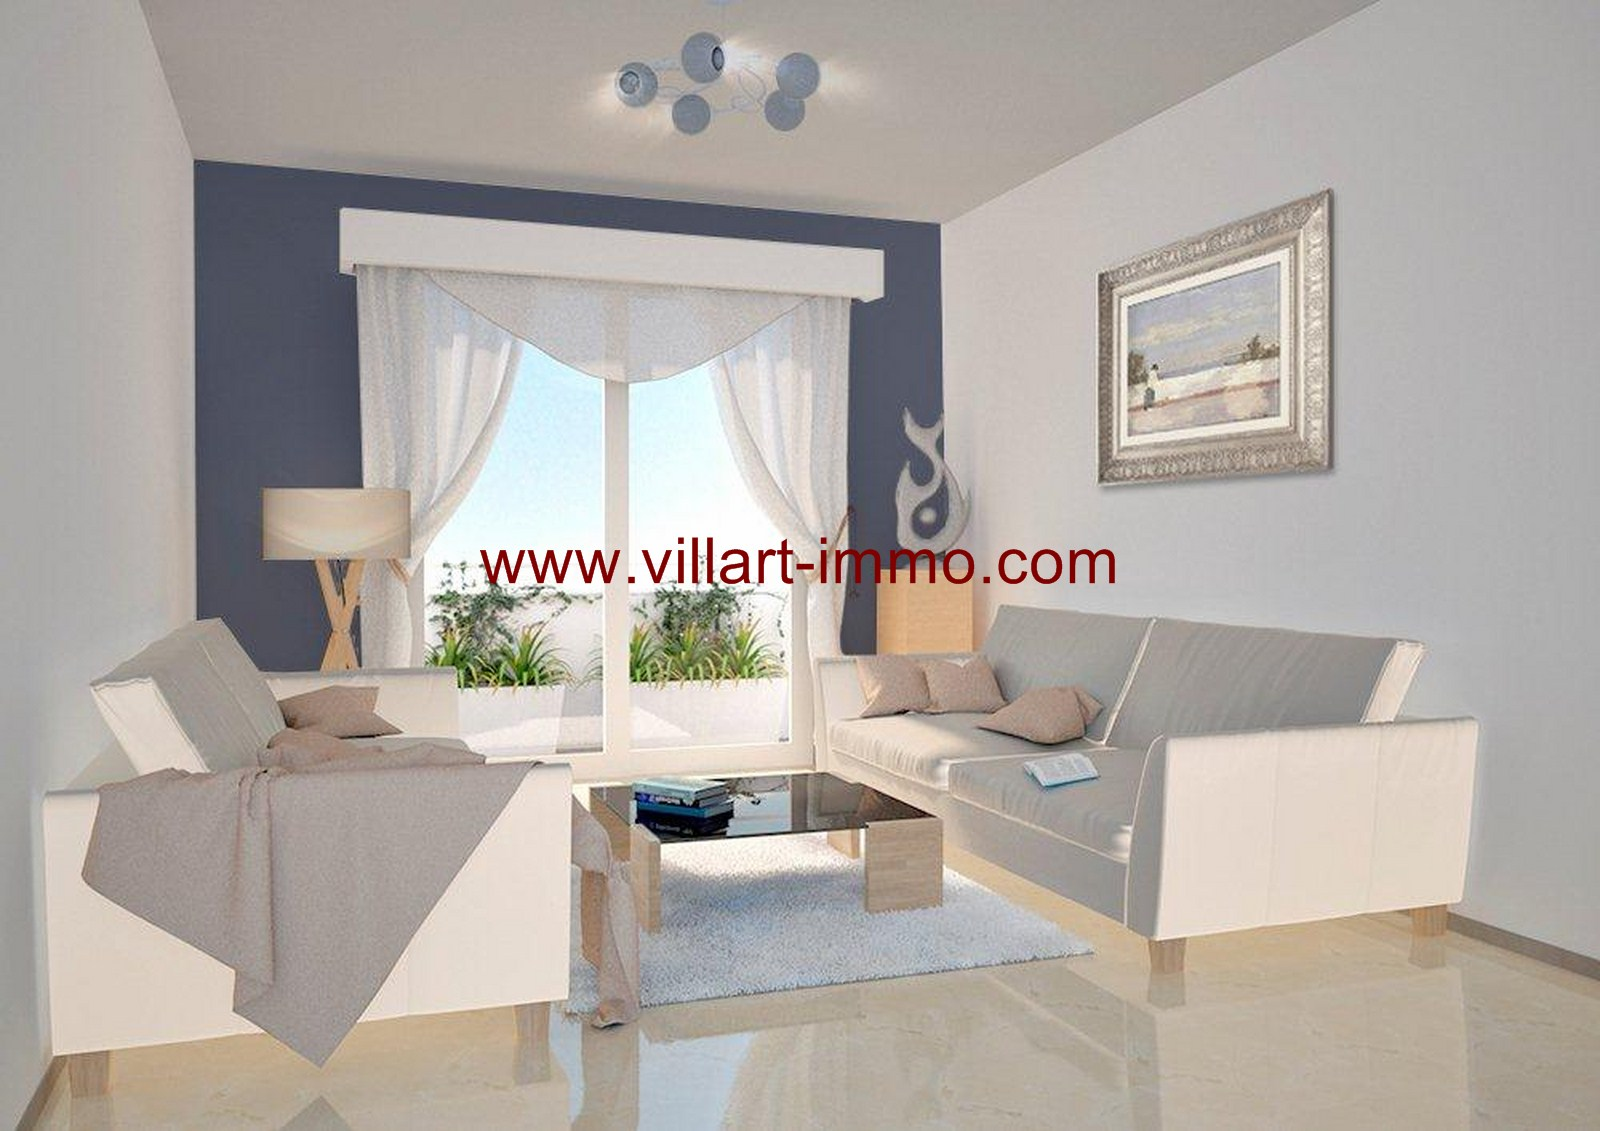 2-Vente-Appartement-Tanger-Centre-ville-SHAZ-Villart Immo